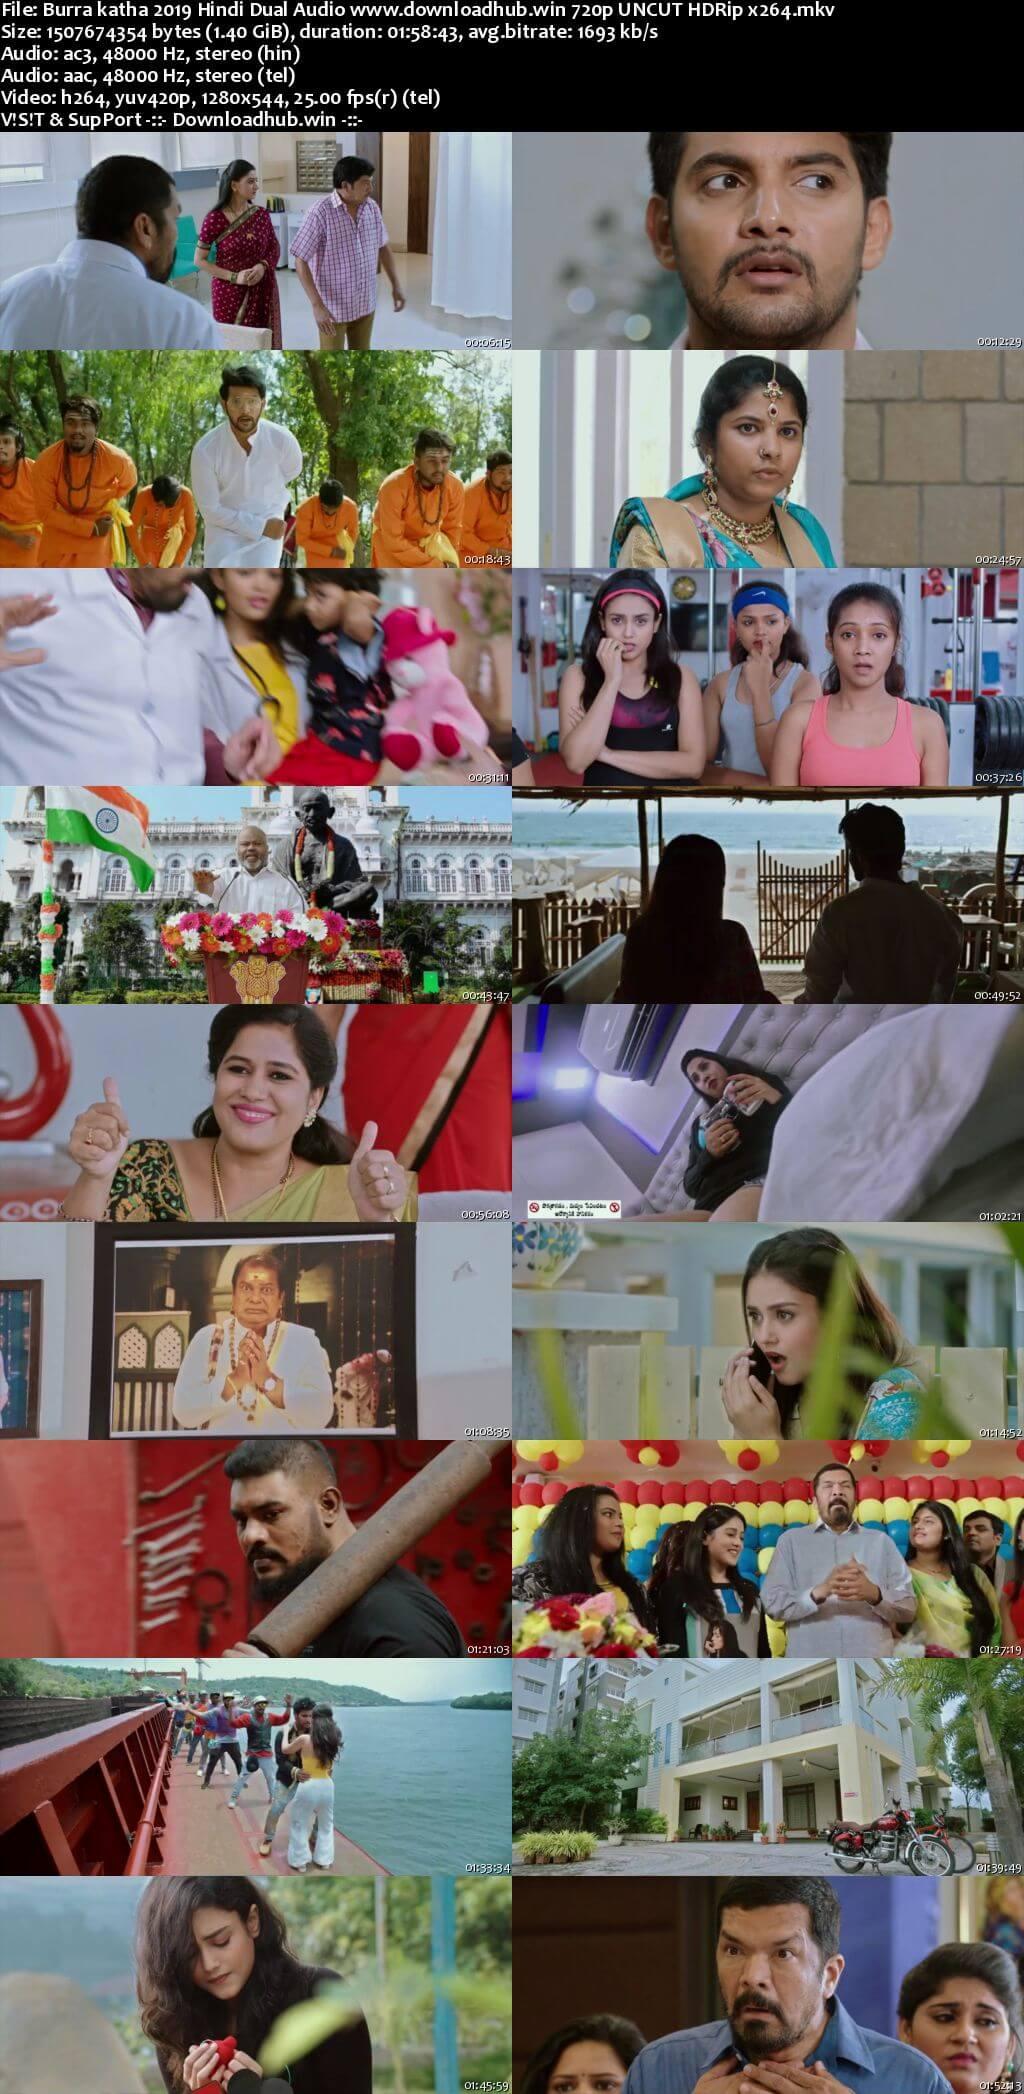 Burra katha 2019 Hindi Dual Audio 720p UNCUT HDRip x264